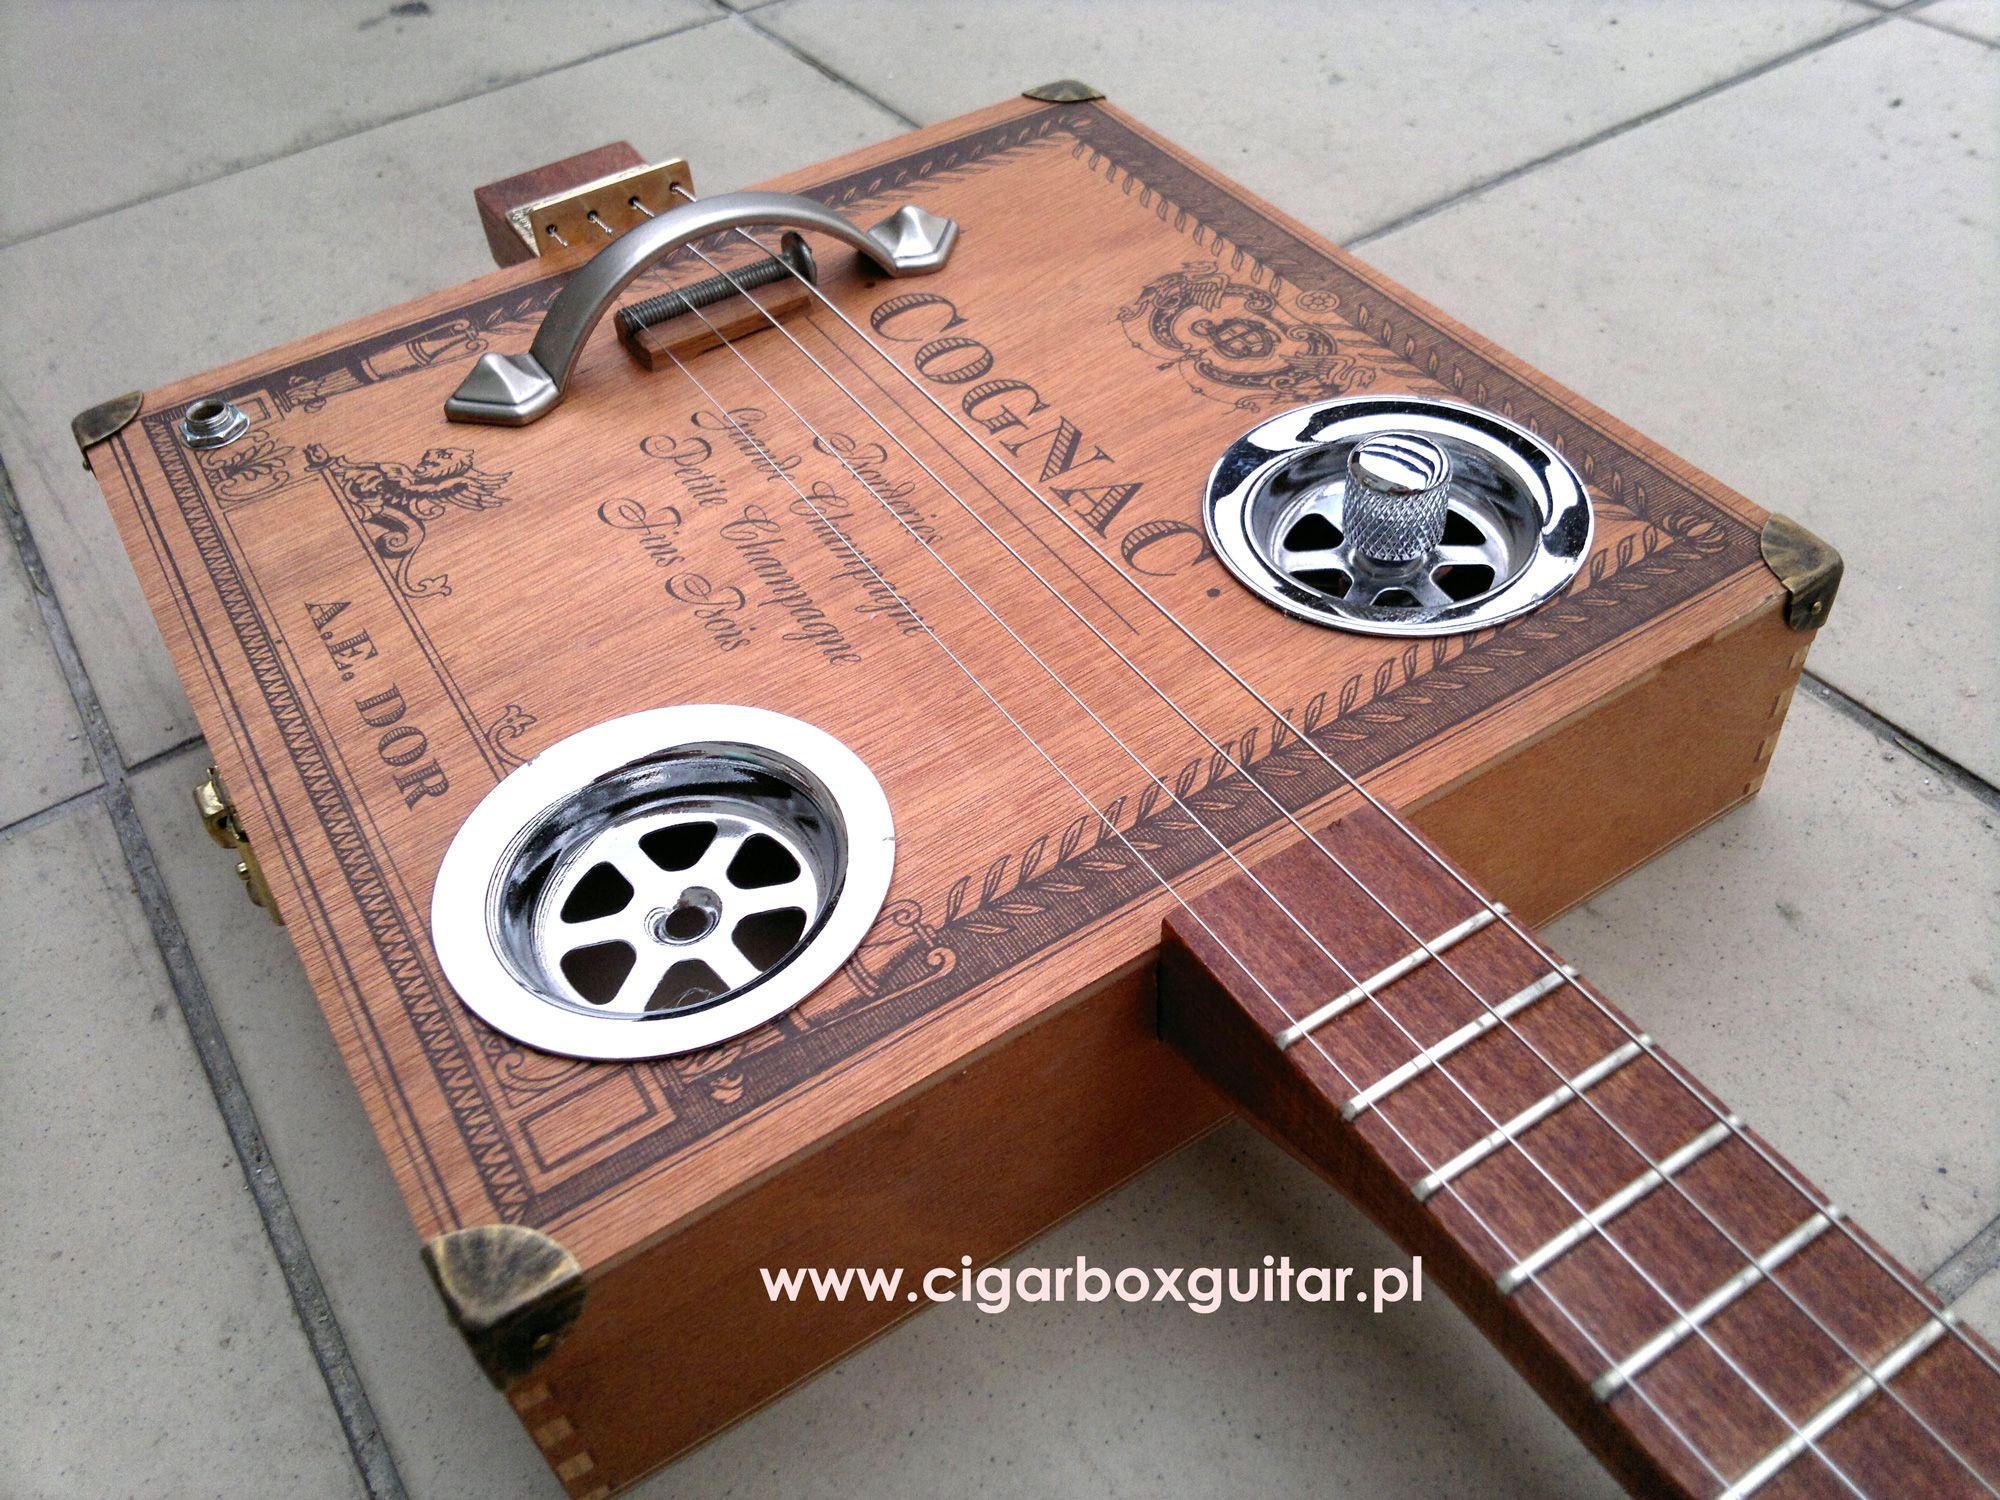 cigar box guitars | Next